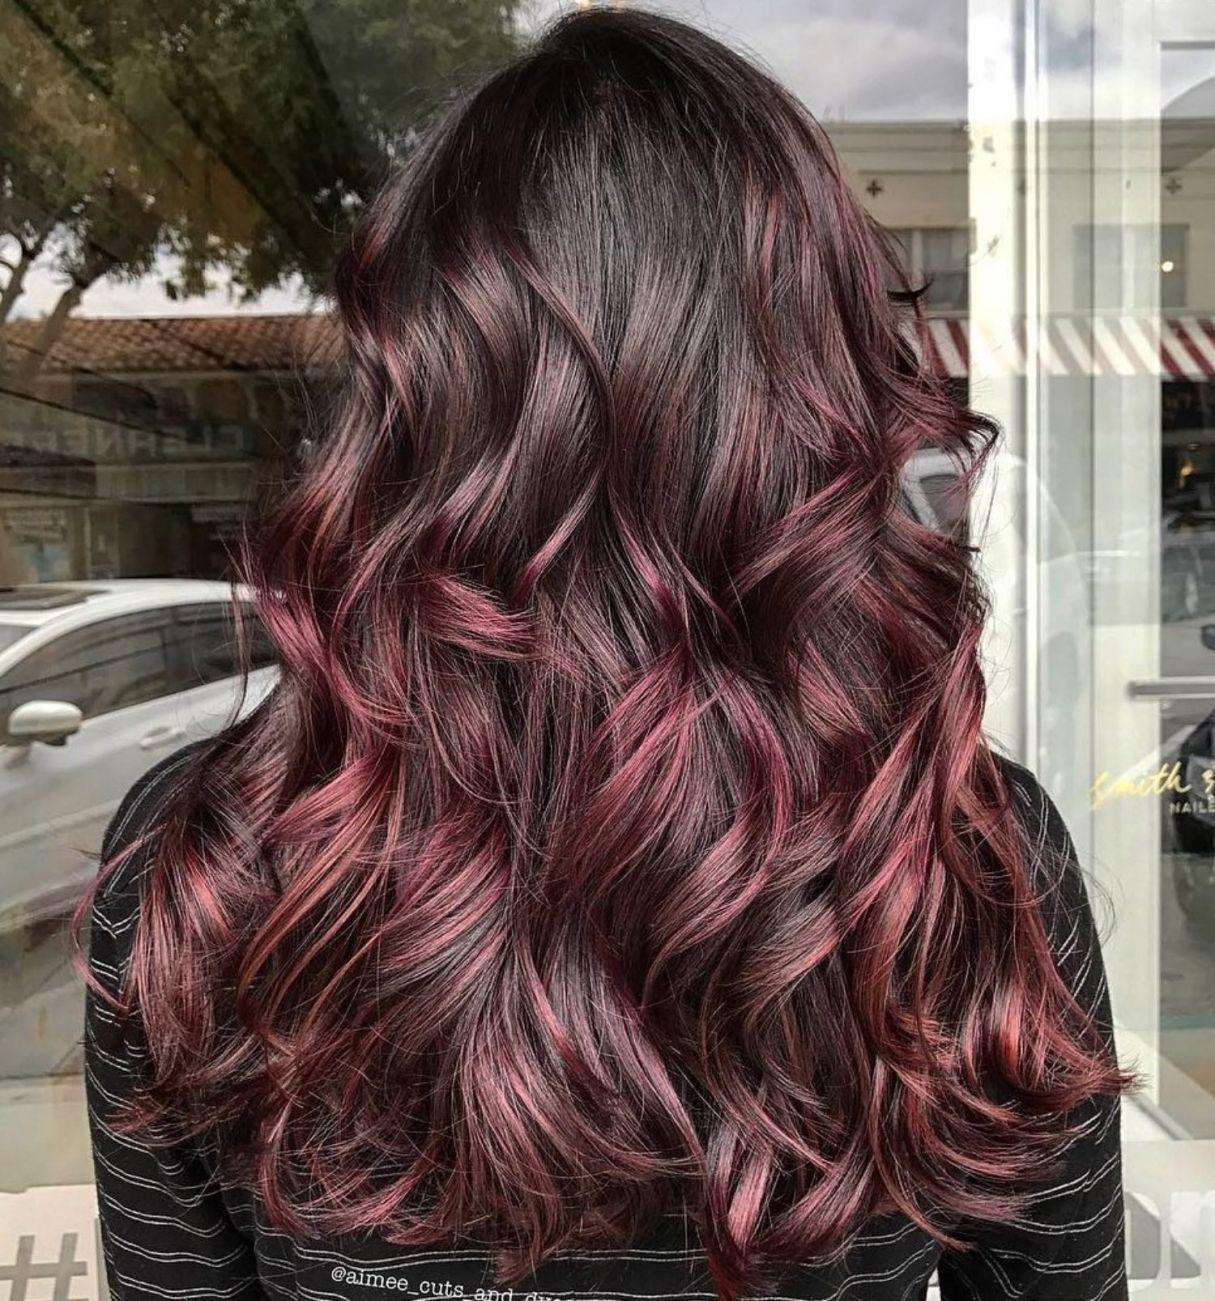 45 Shades Of Burgundy Hair Dark Burgundy Maroon Burgundy With Red Purple And Brown Highlights Burgundy Hair Fall Hair Color For Brunettes Burgundy Brown Hair